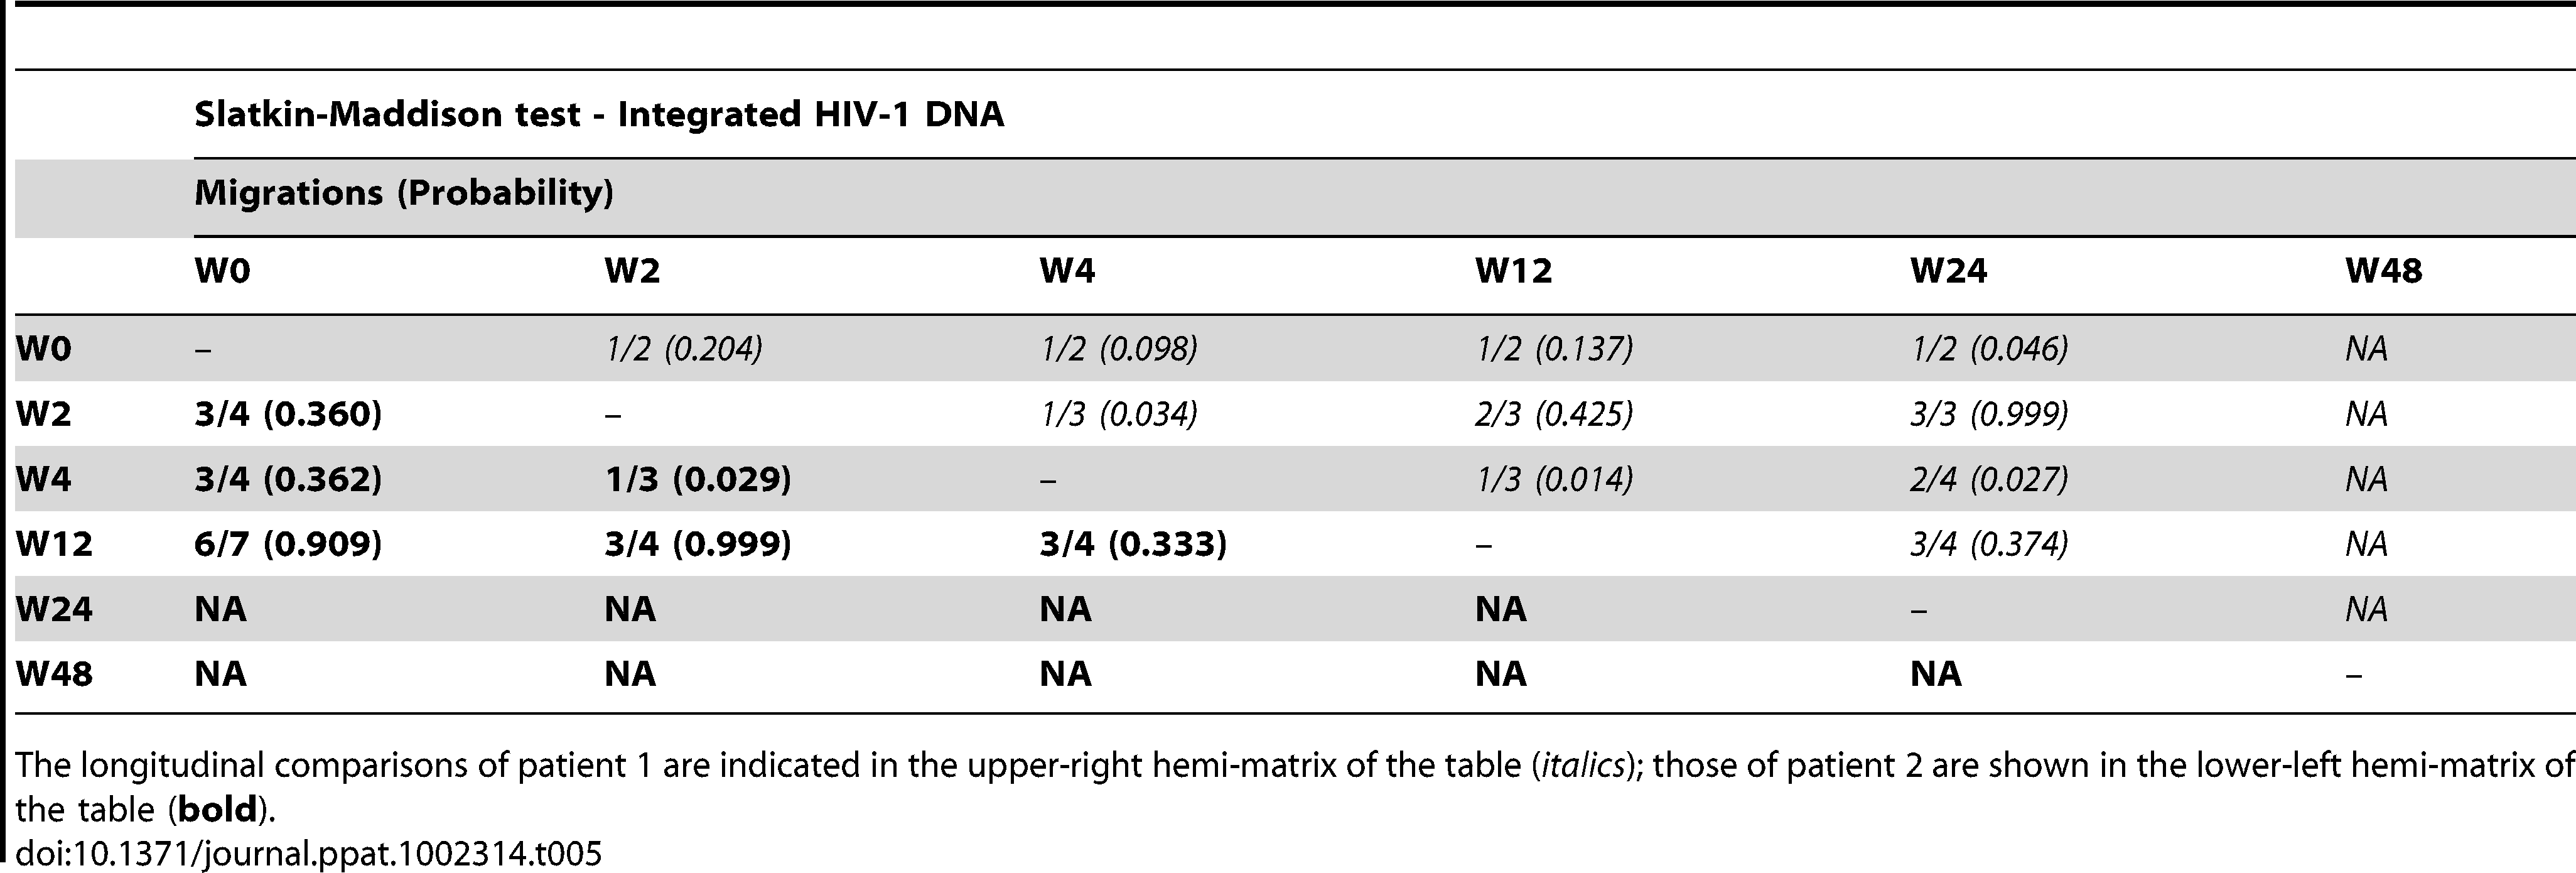 Temporal population structure: Slatkin-Maddison test for comparison between longitudinal integrated HIV-1 DNA.